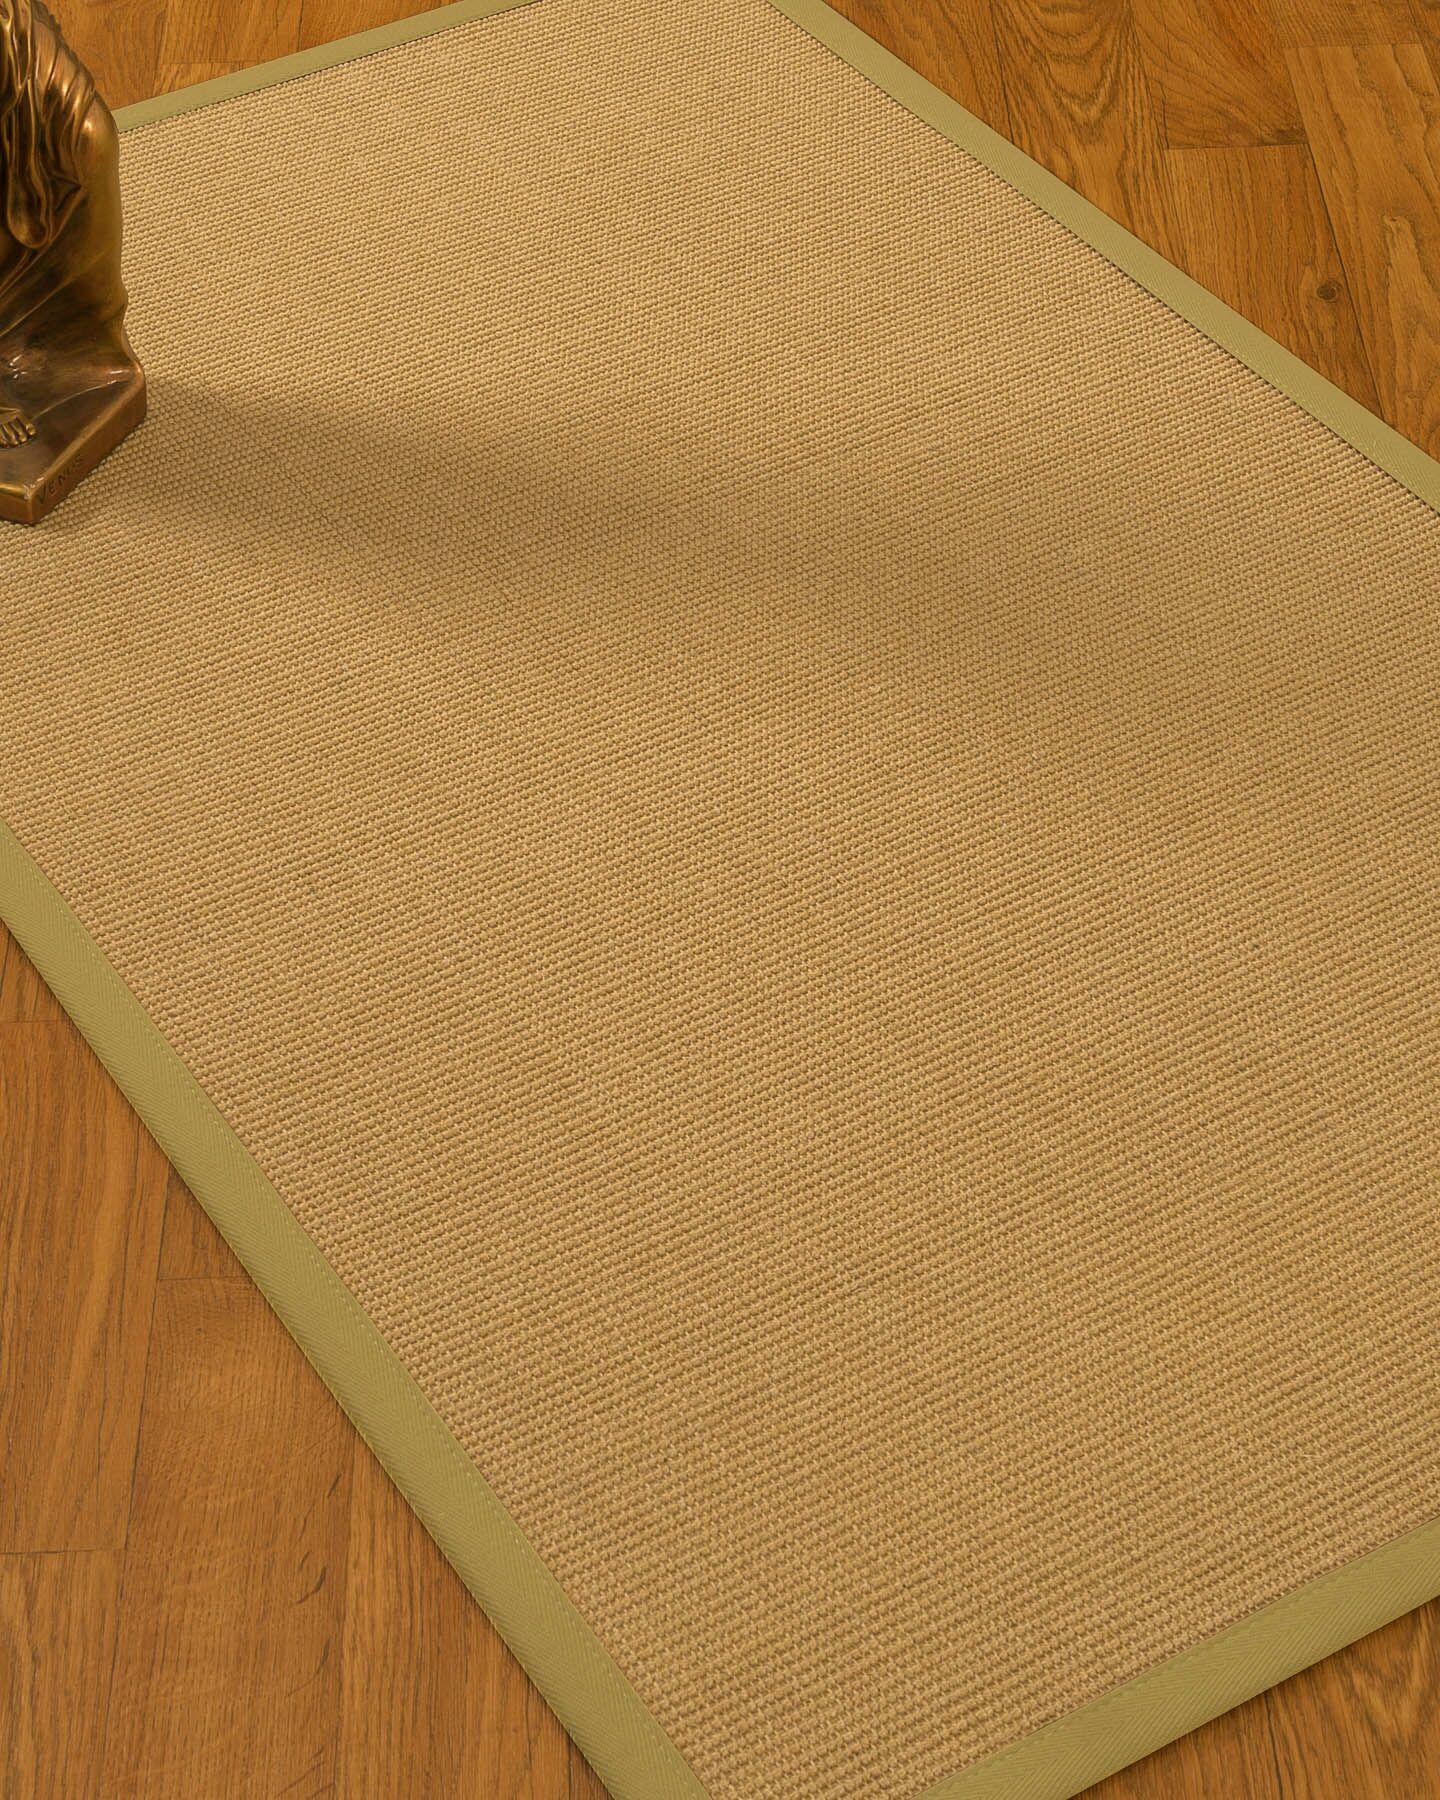 Astley Hand Woven Beige Area Rug Rug Size: Rectangle 5' x 8'